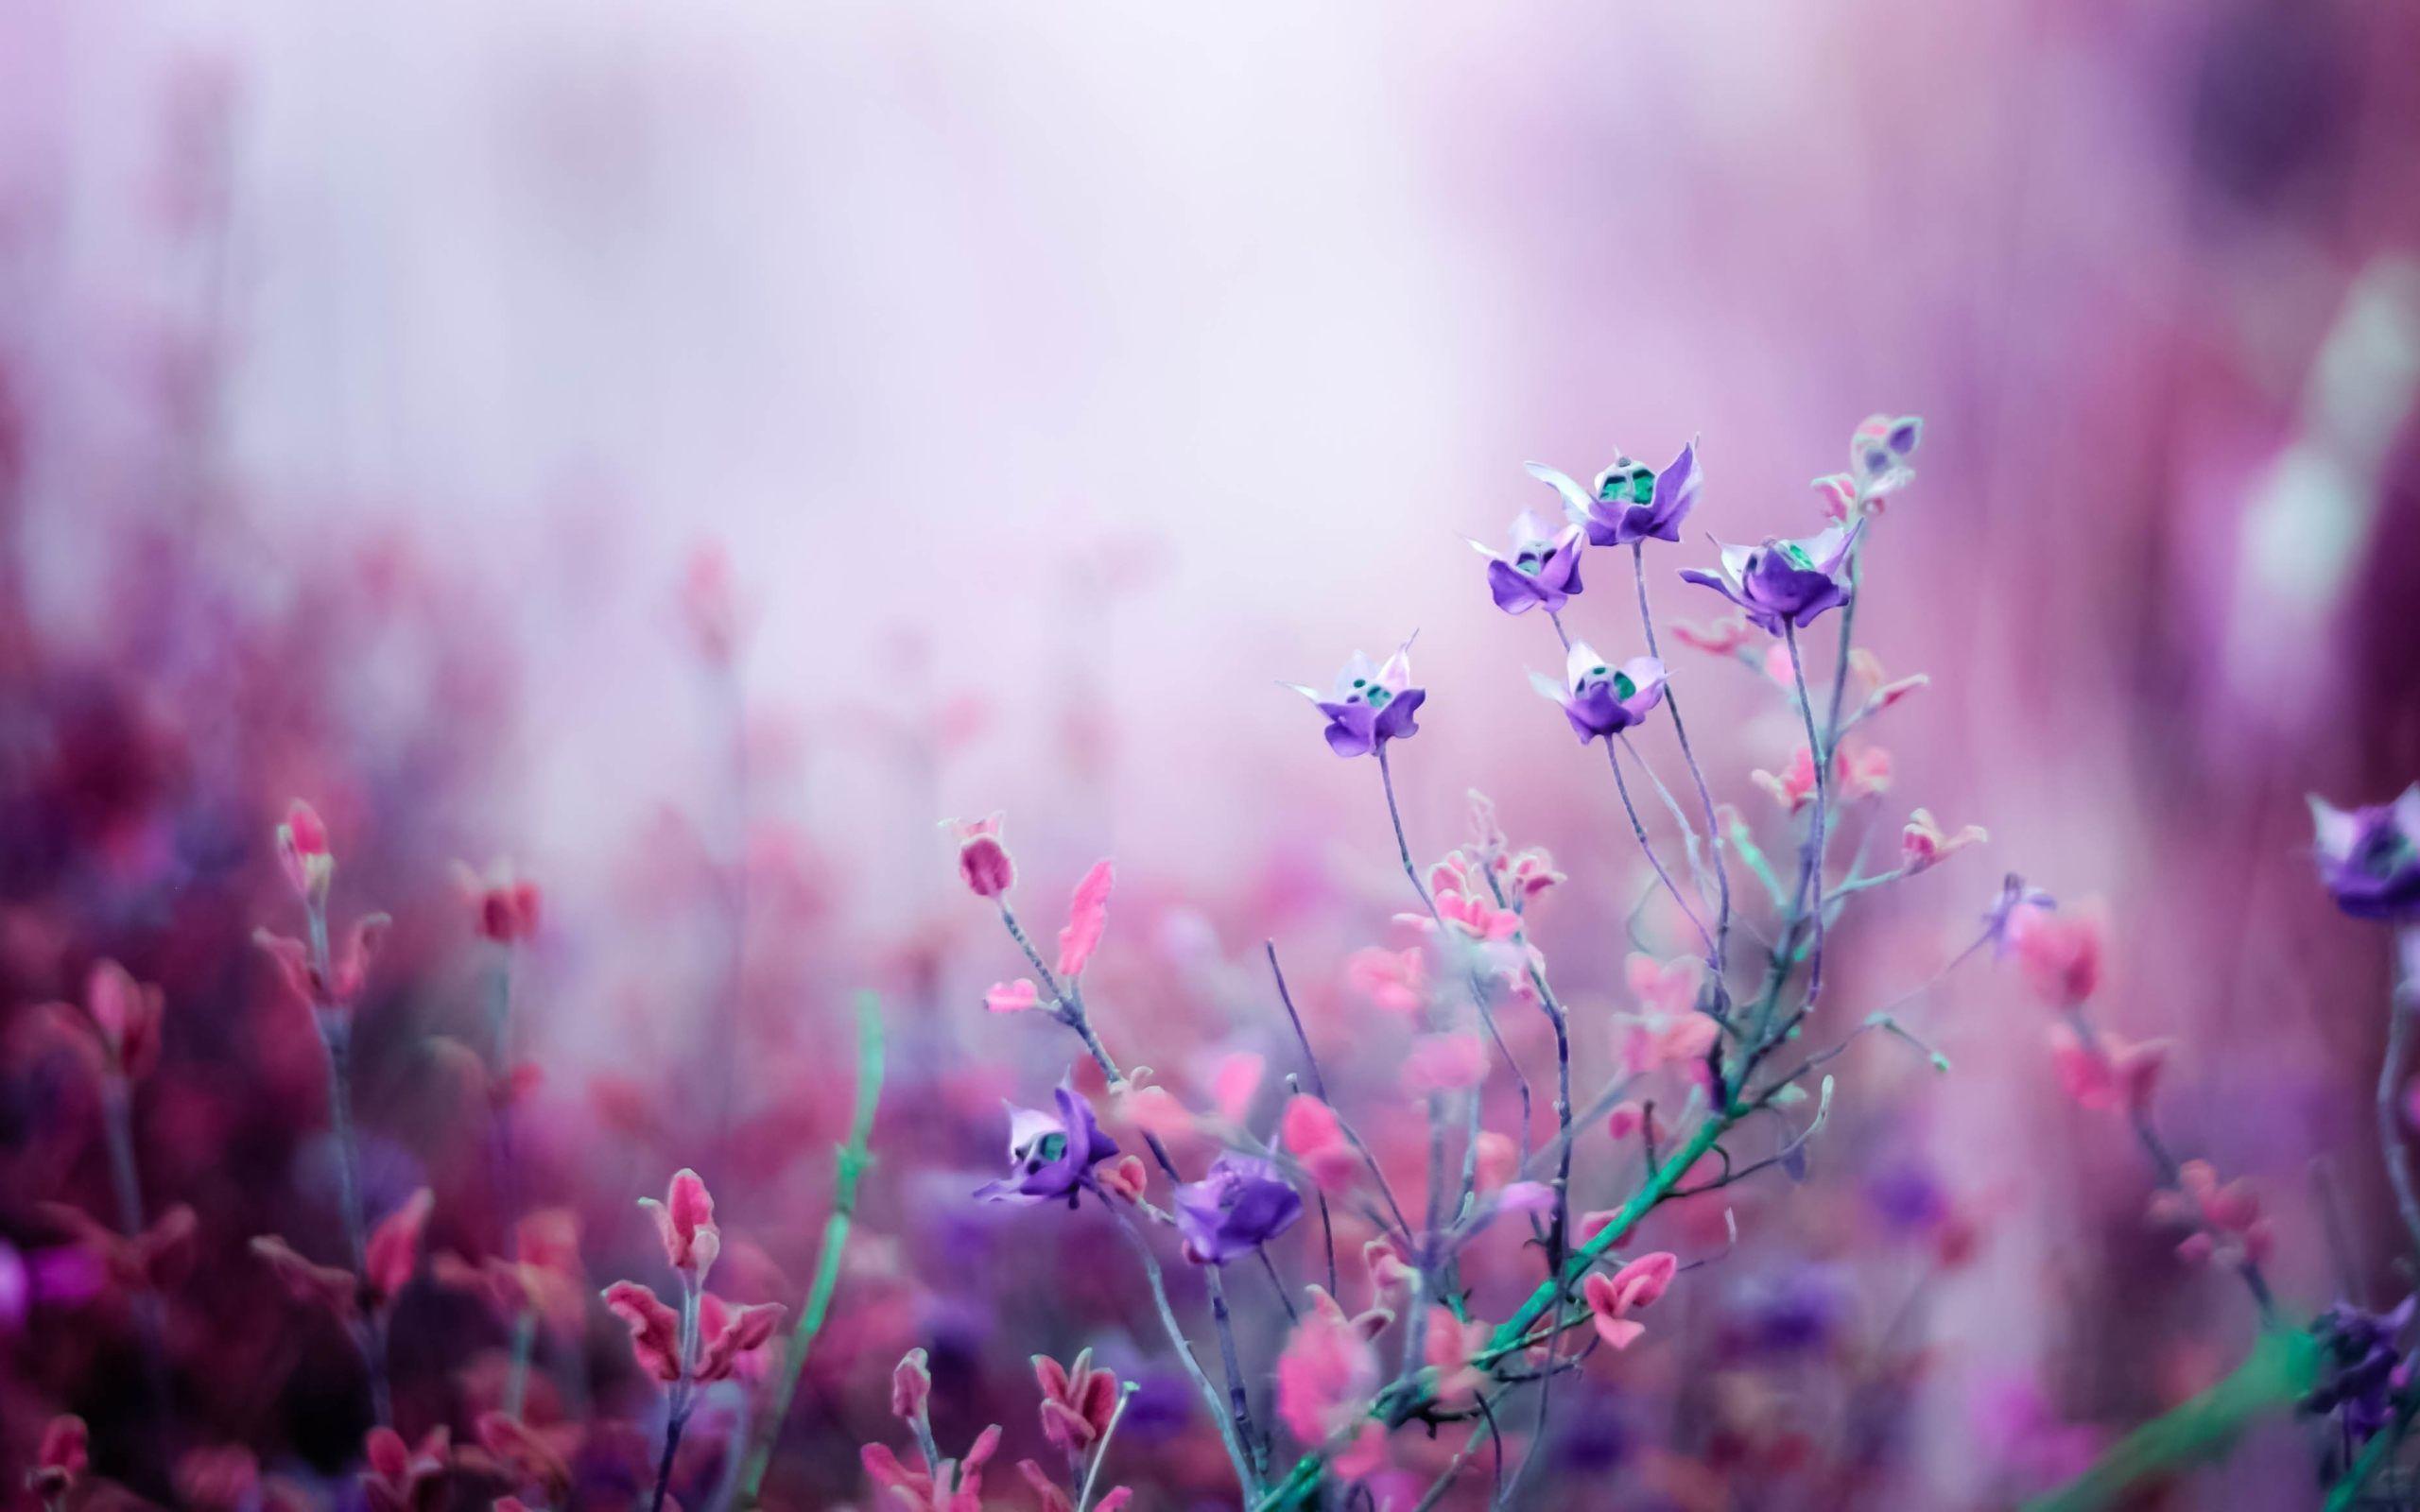 Purple Flower Wallpapers - Top Free ...